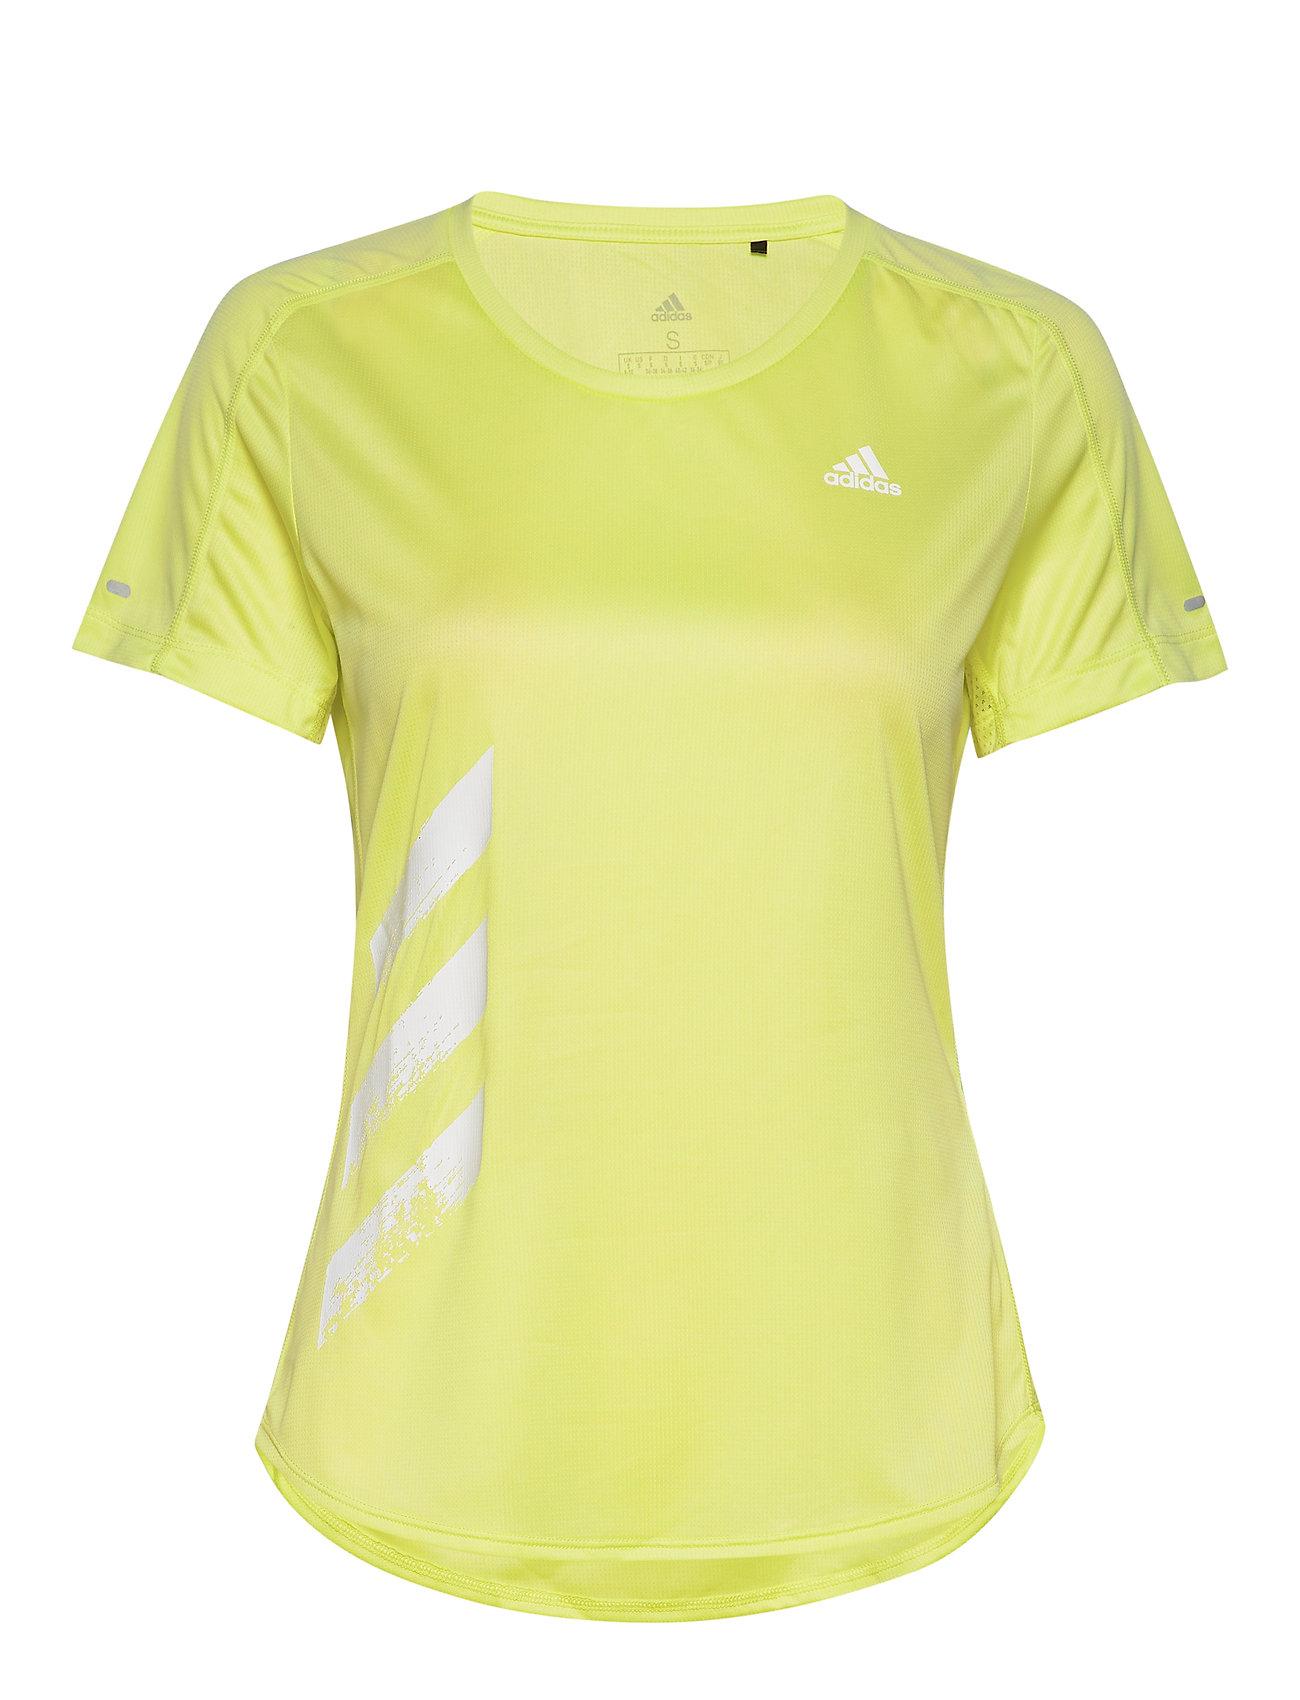 Image of Run It Tee 3s W T-shirt Top Gul Adidas Performance (3406255111)